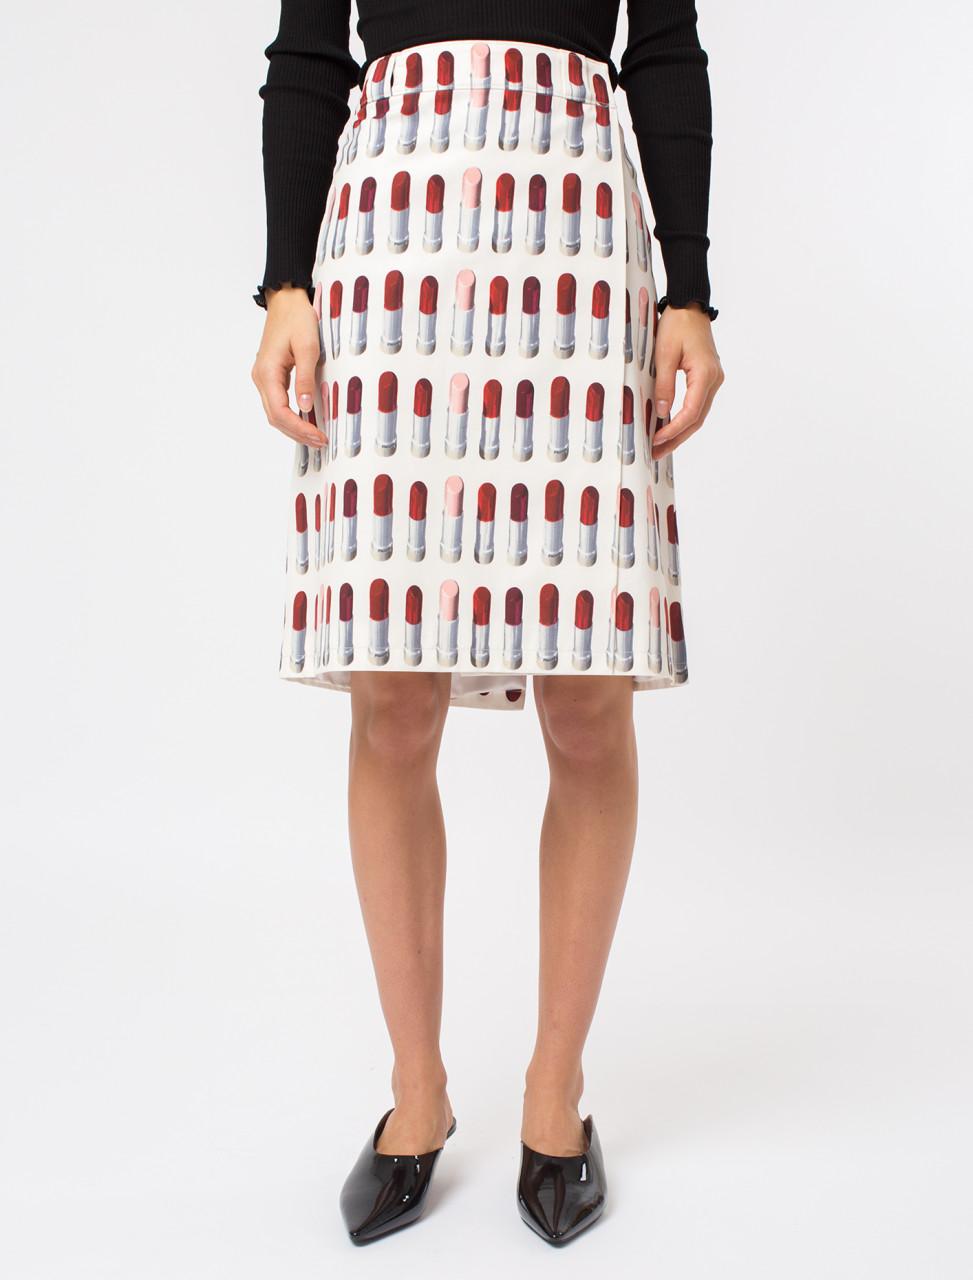 Lipstick Print Poplin Skirt